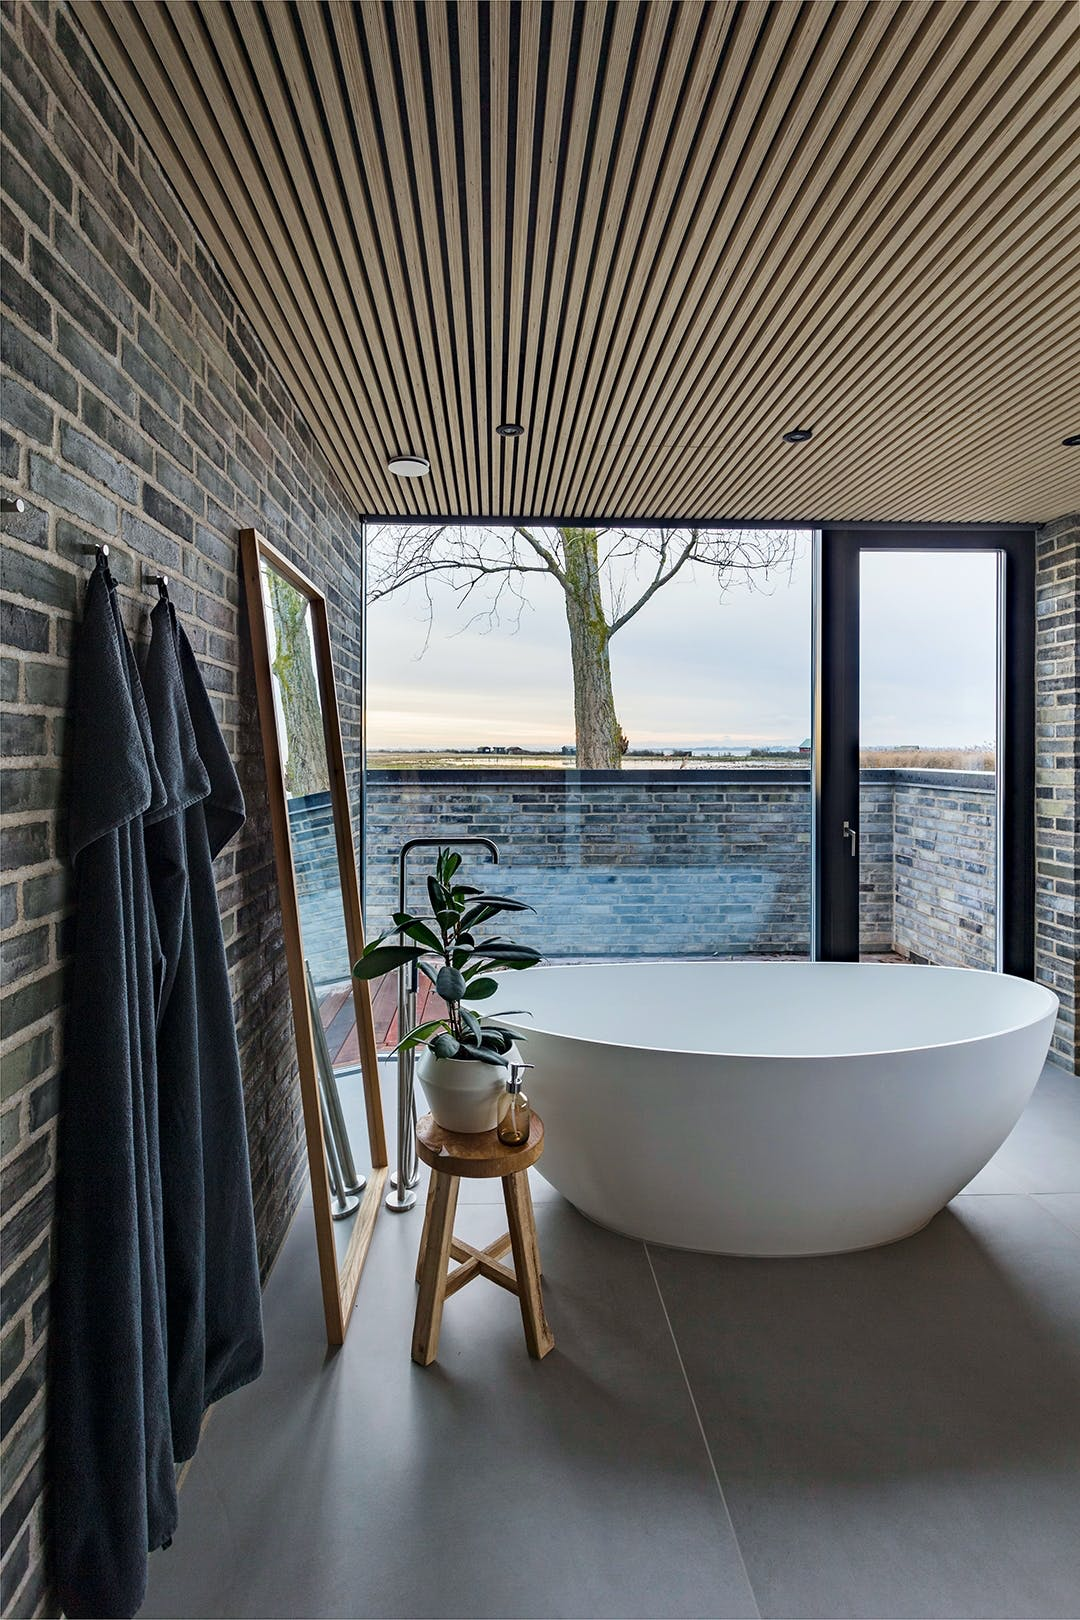 Sommerhus badeværelse badekar